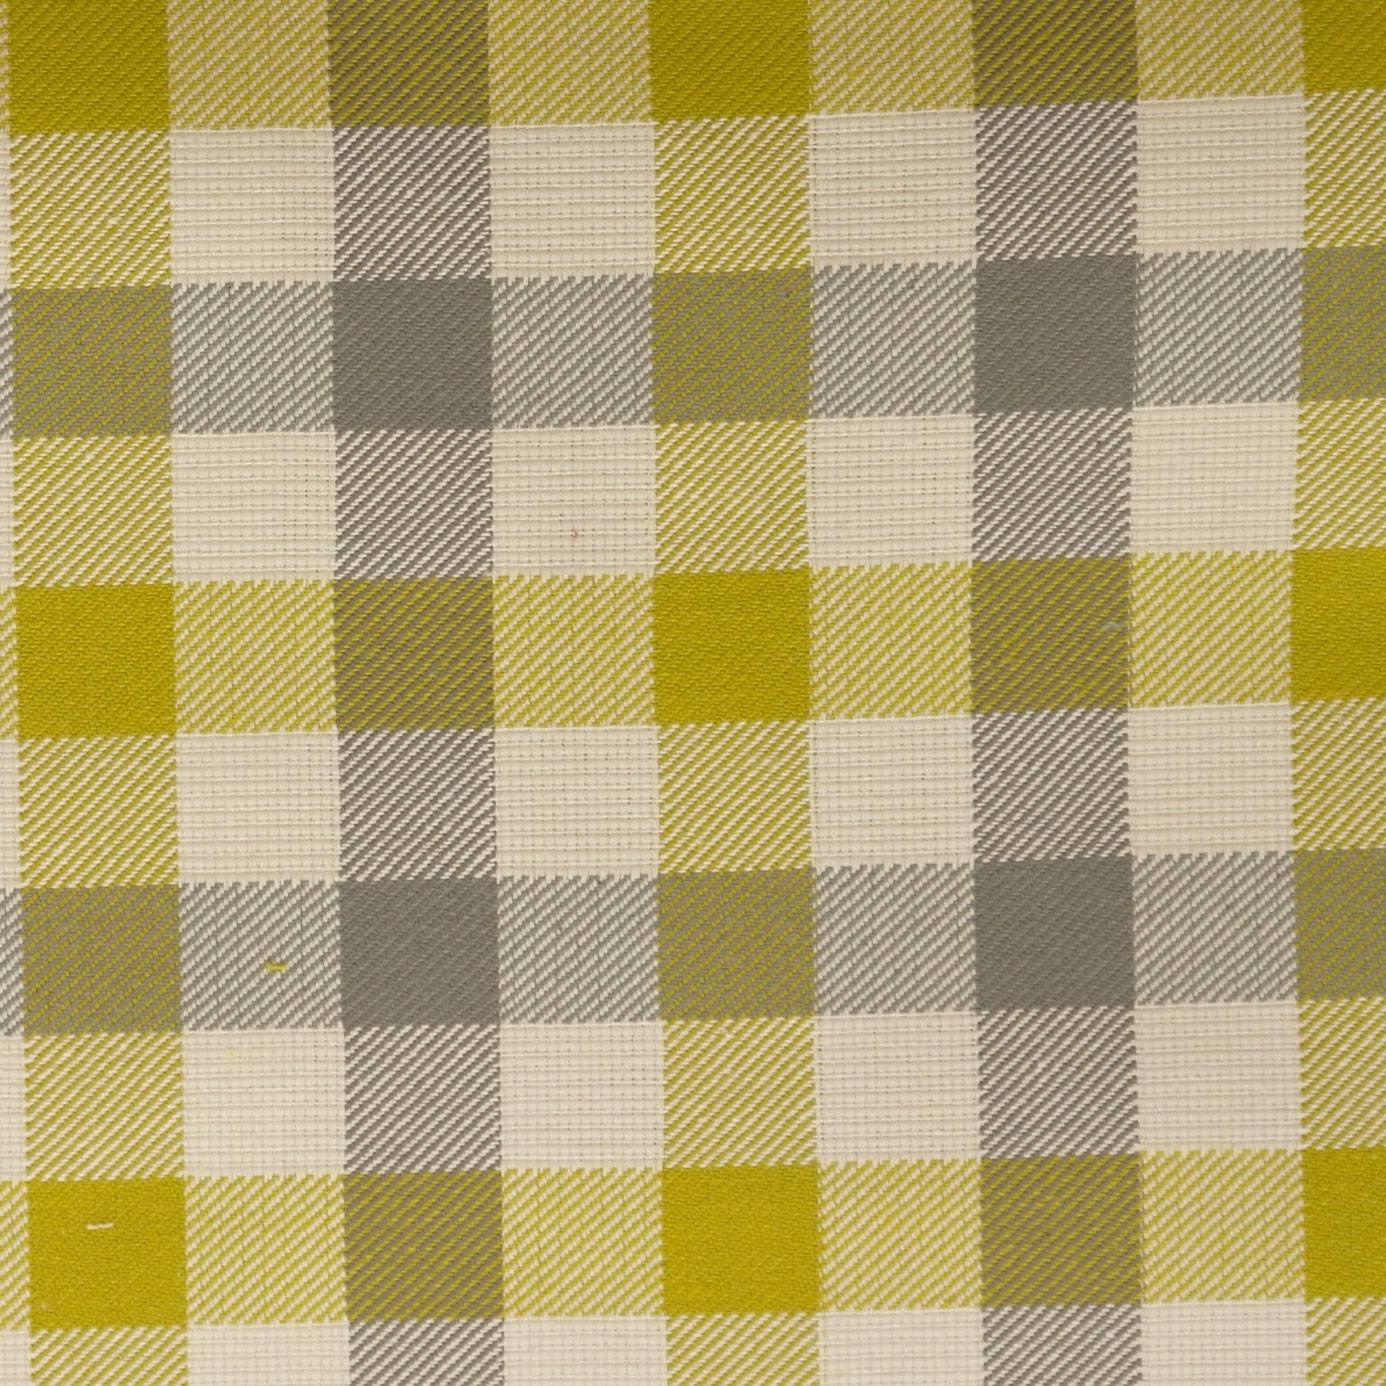 Glen Fabric Pistachio 3148 651 Prestigious Textiles